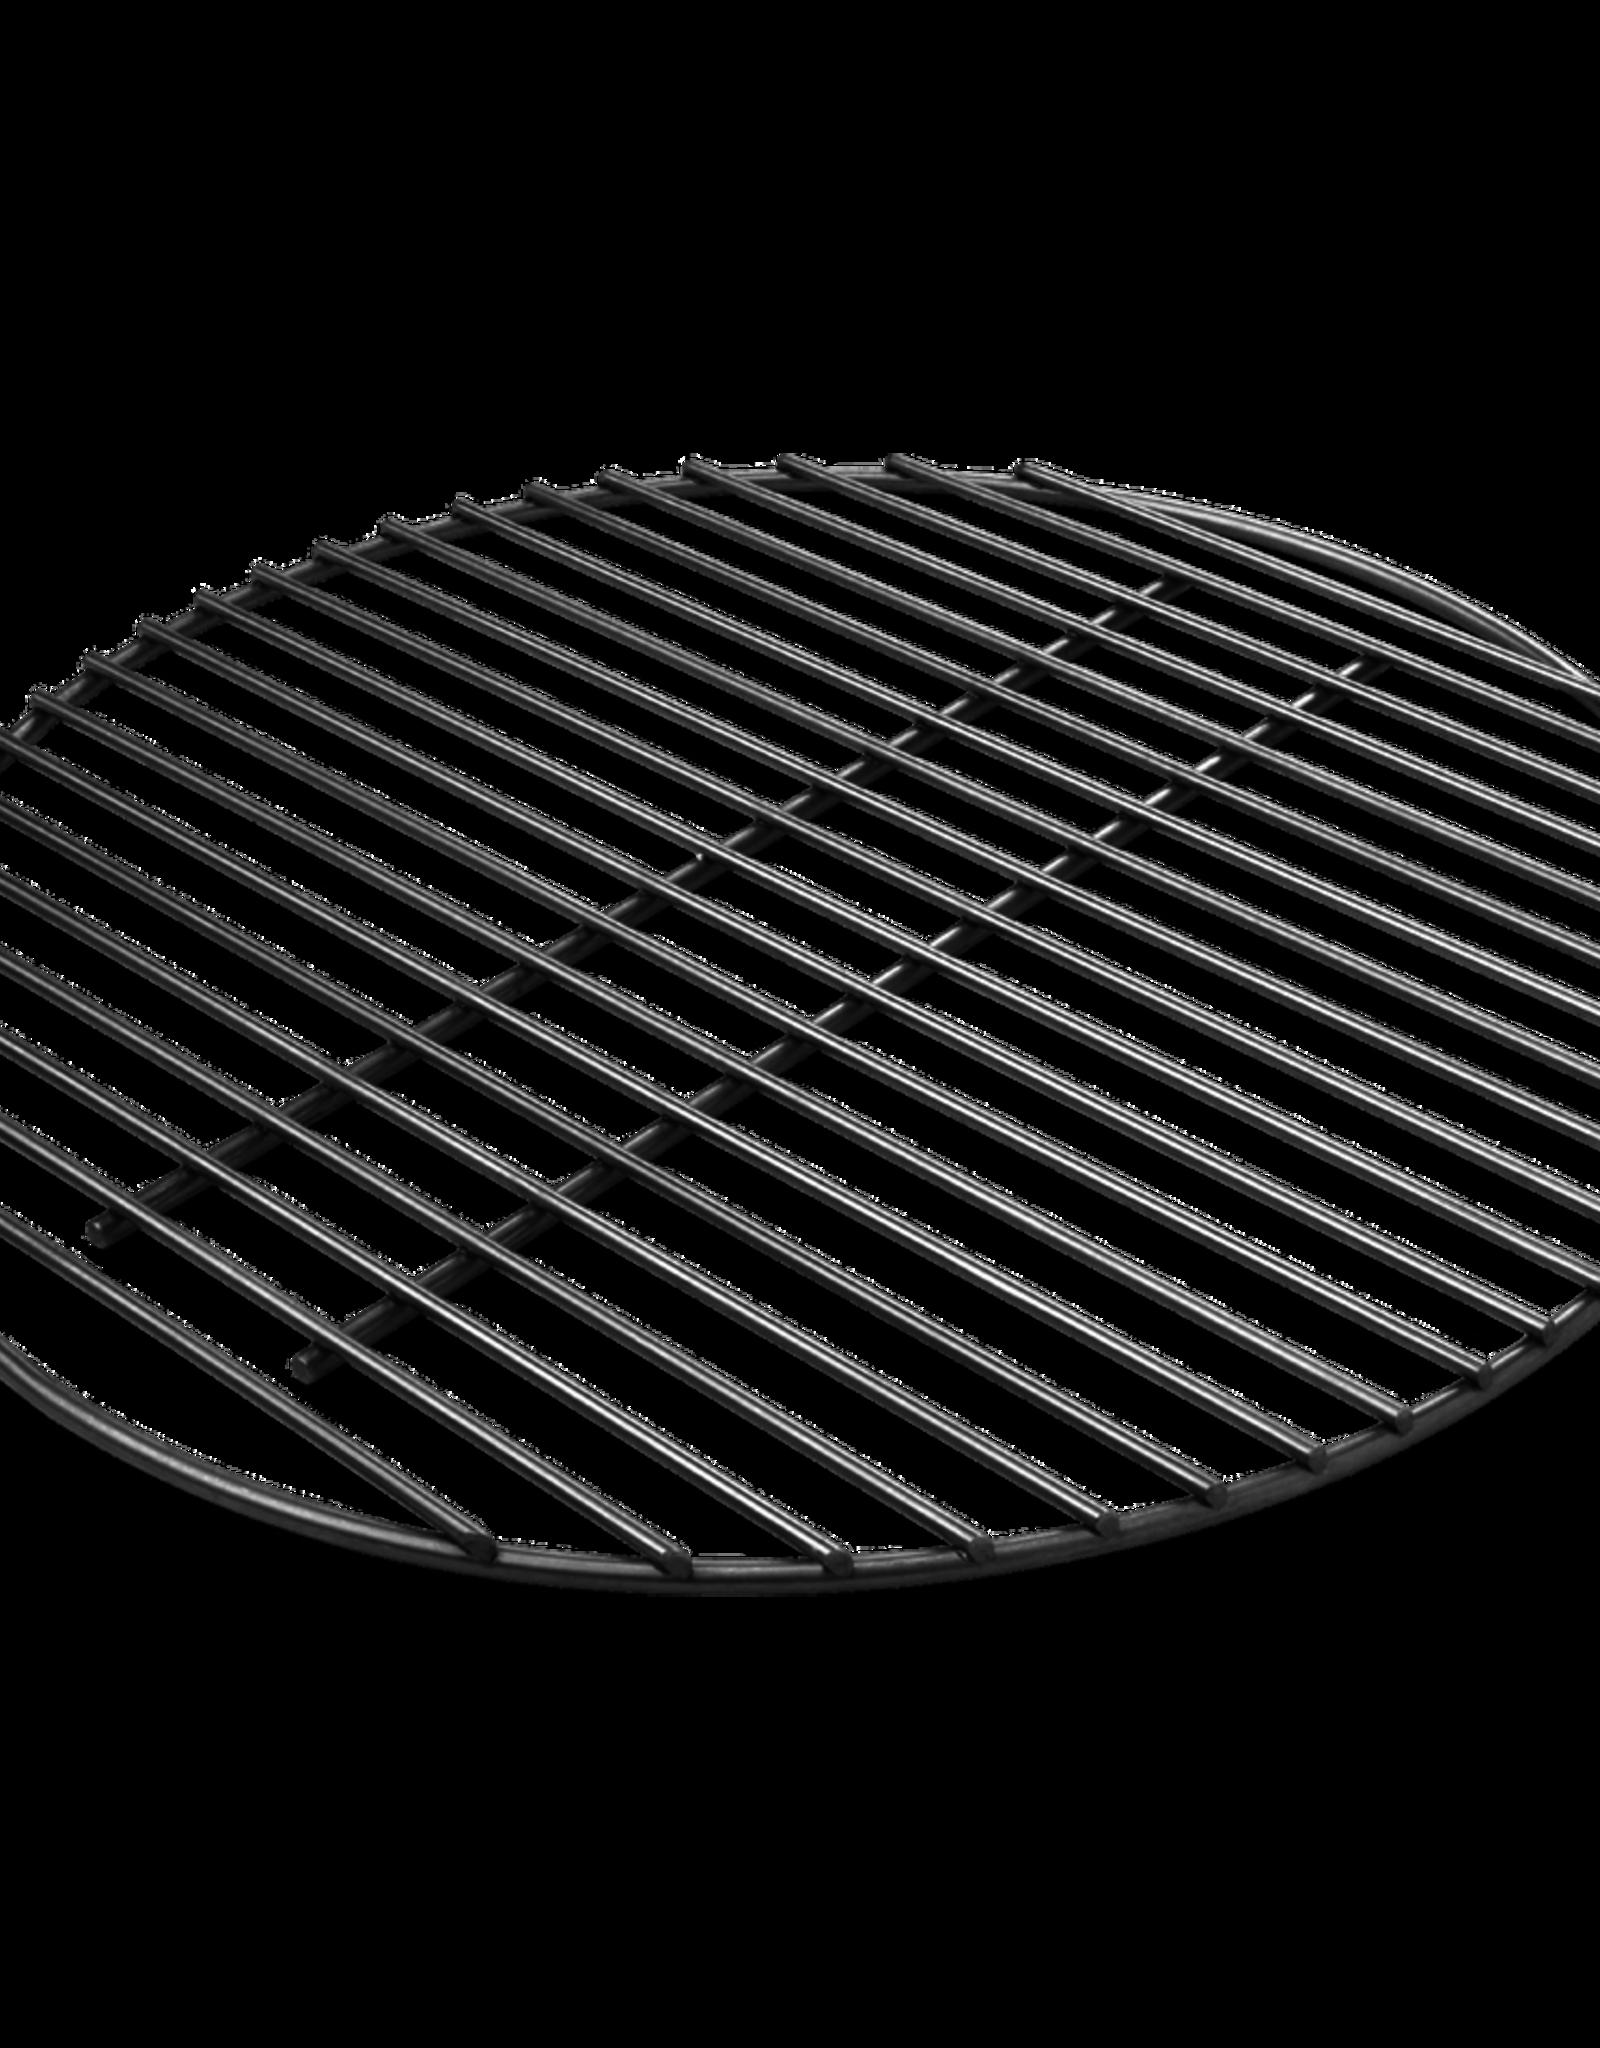 "Weber Charcoal Grate - Fits 22'' (not Smokey Mountain Cookerâ""¢ Smoker)"